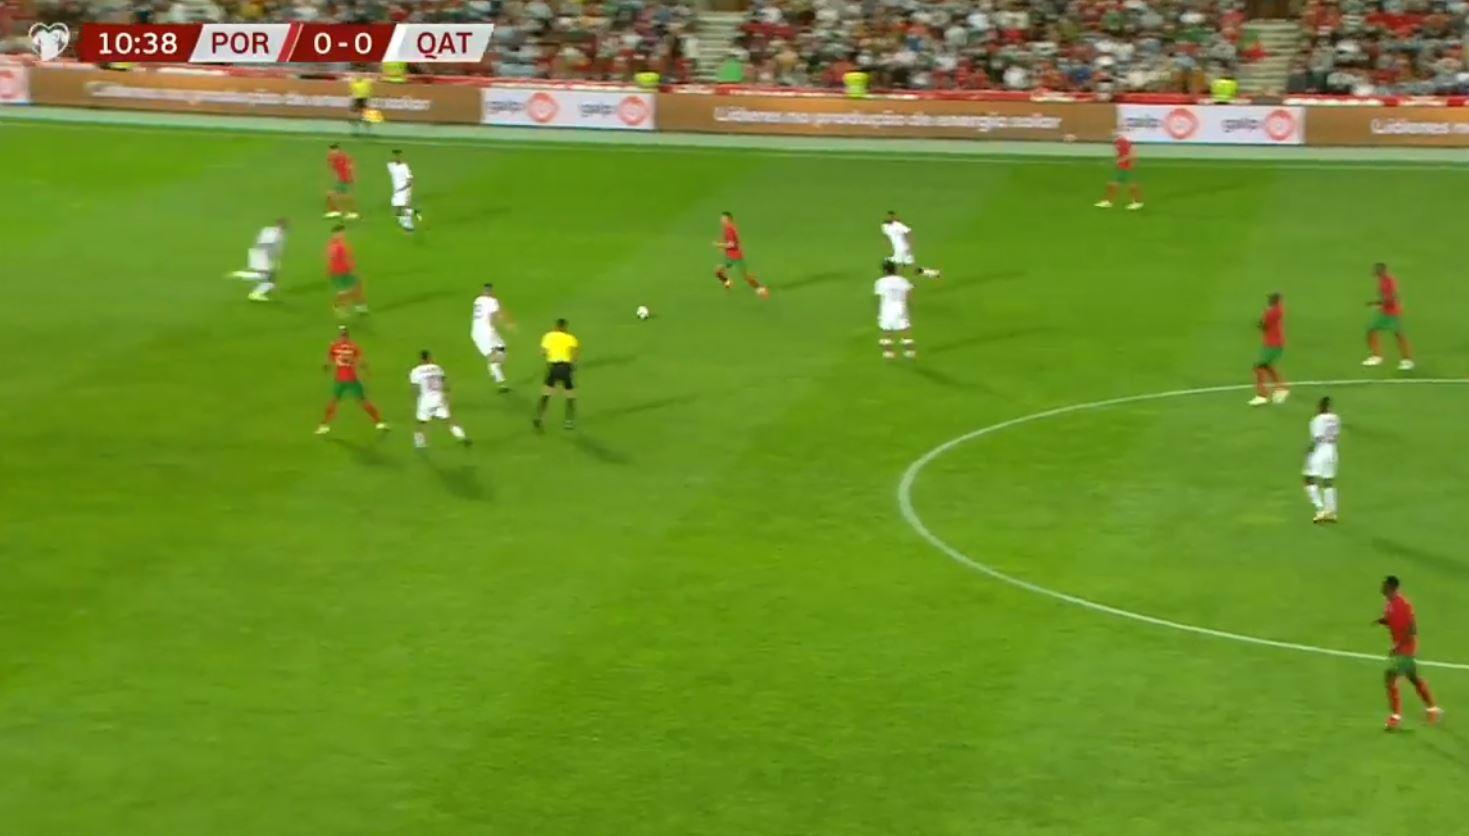 Portugal 3-0 Qatar (Friendly) - 2021.10.09 (20h15) Full Goals Highlight